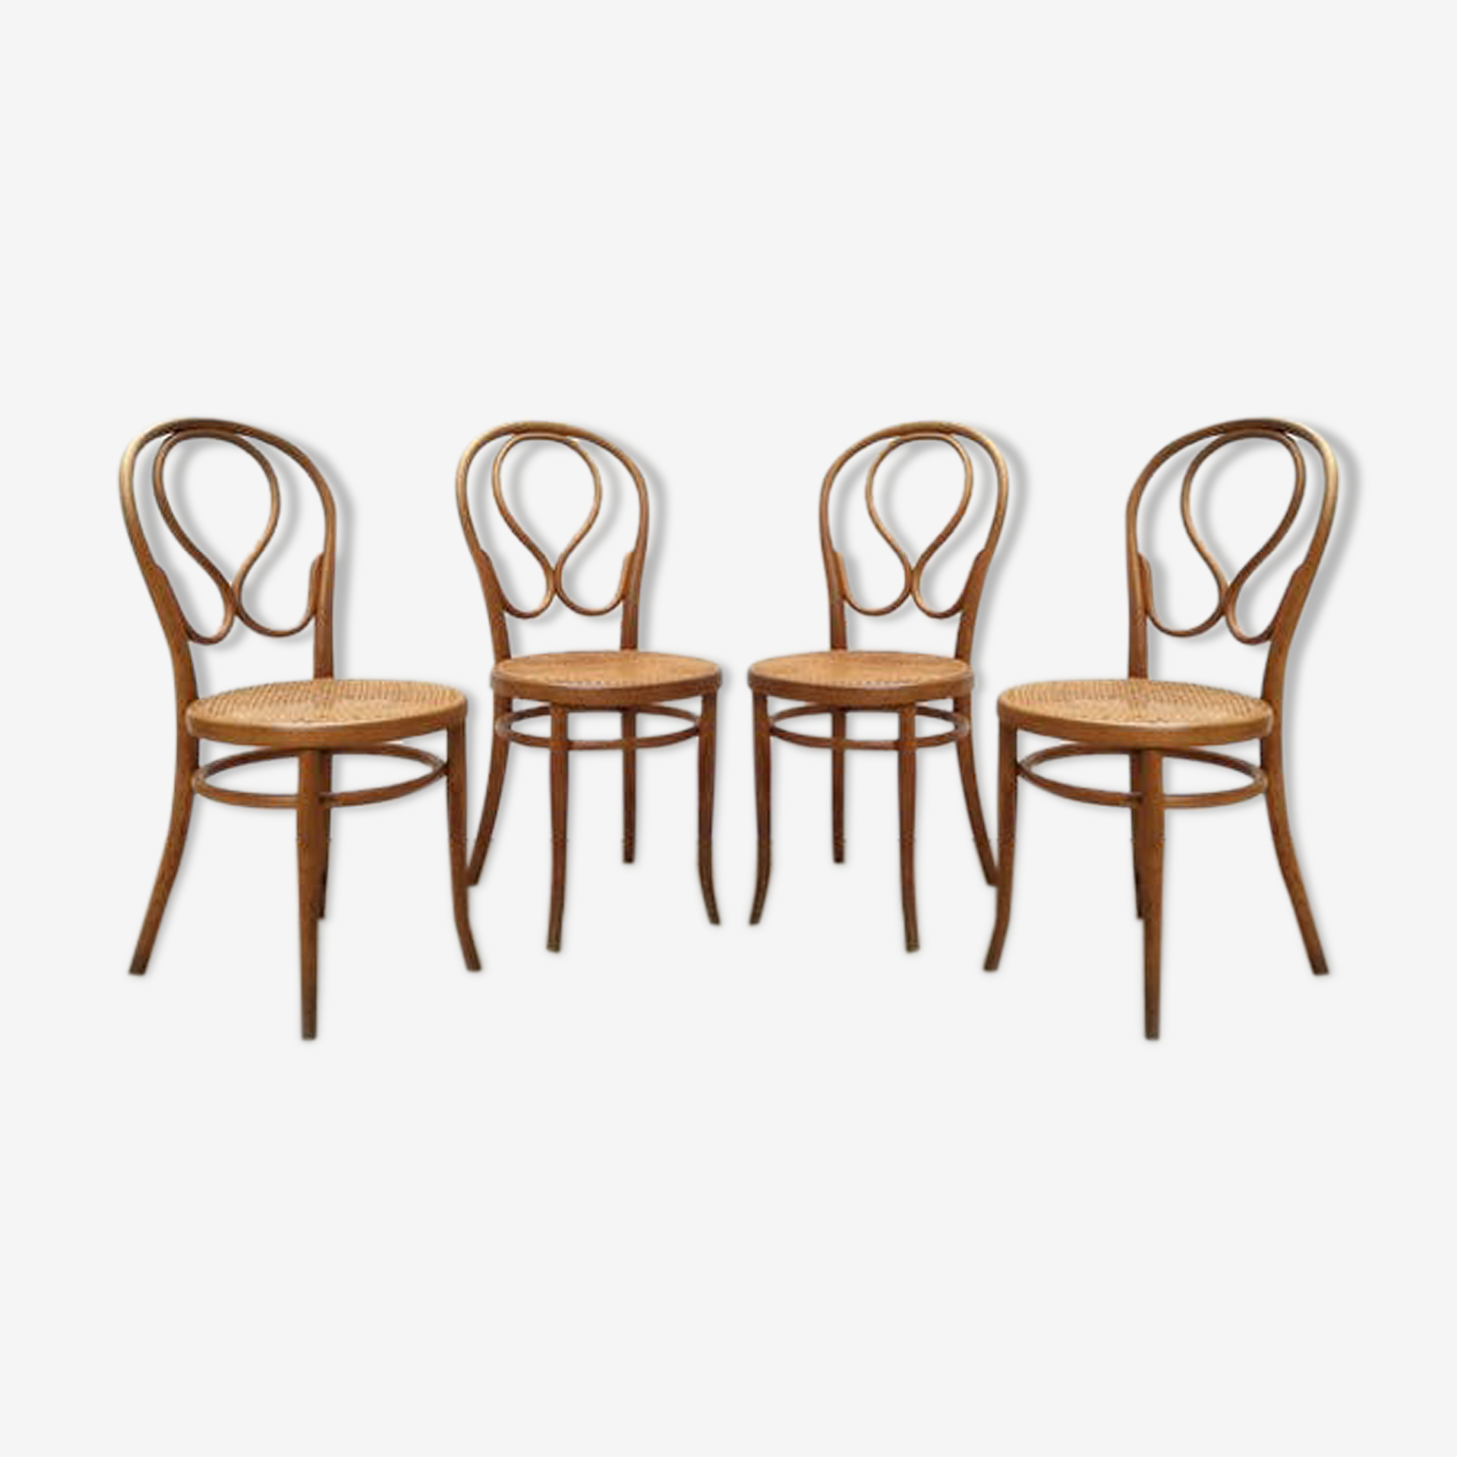 4 chaises bistrot viennoises Thonet